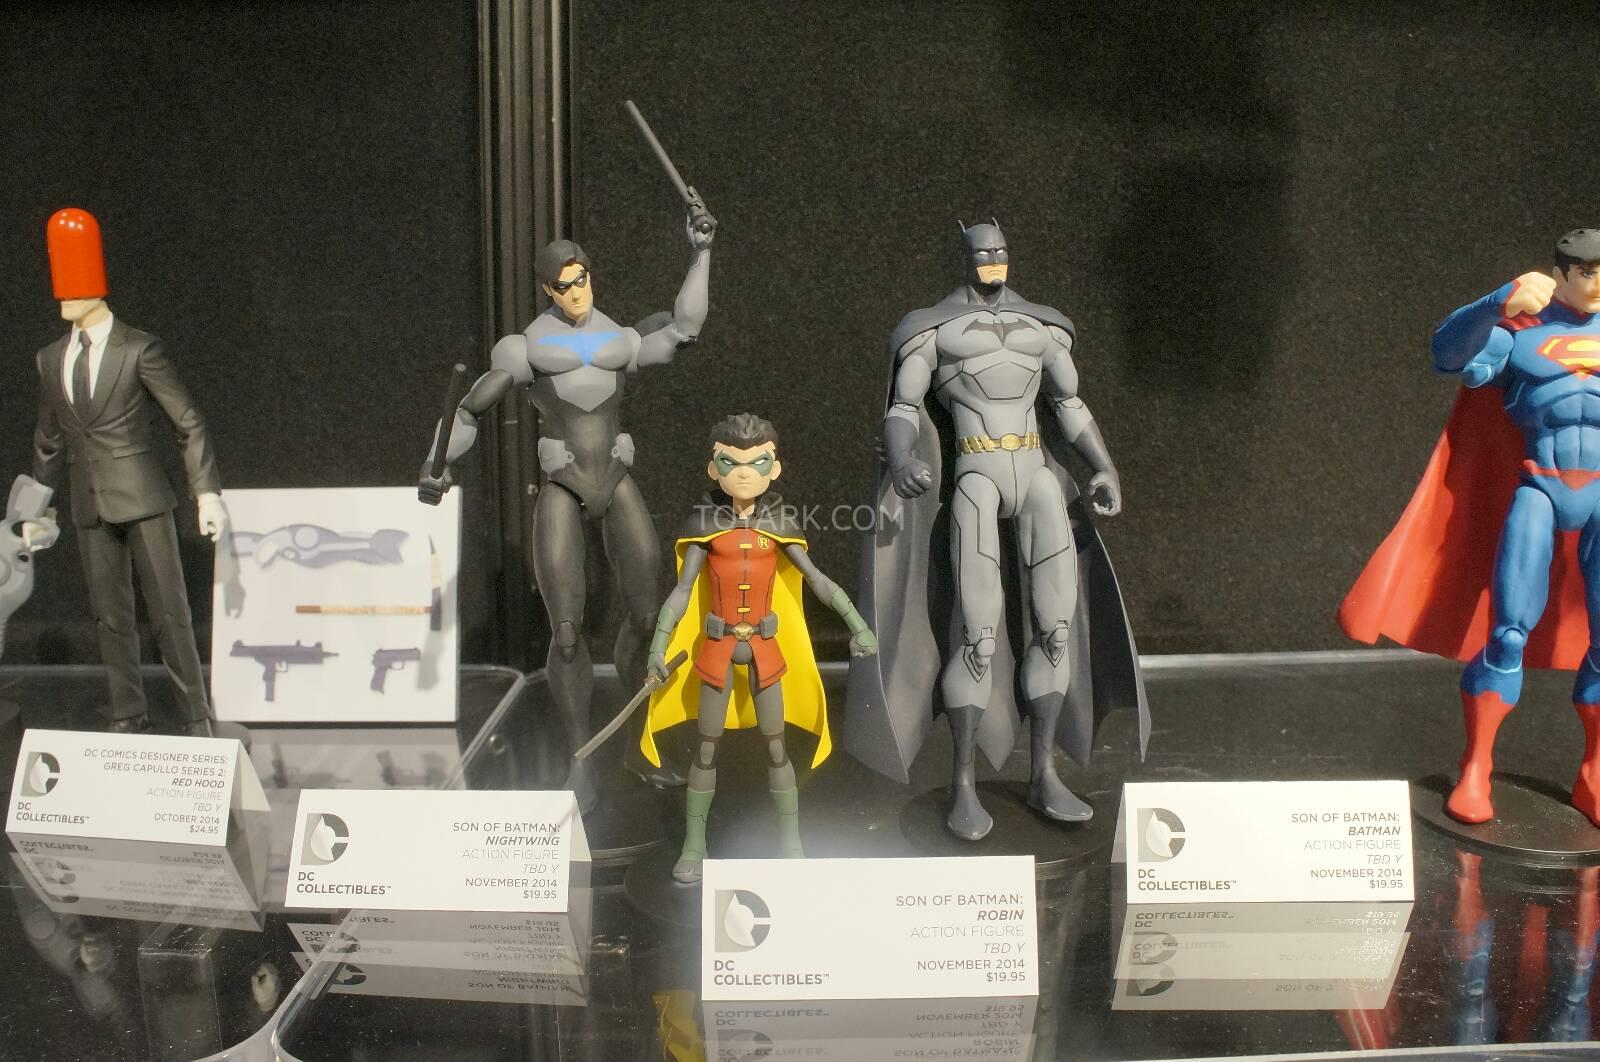 [Toy Fair 2014] DC Collectibles Toy-Fair-2014-DC-Collectibles-105